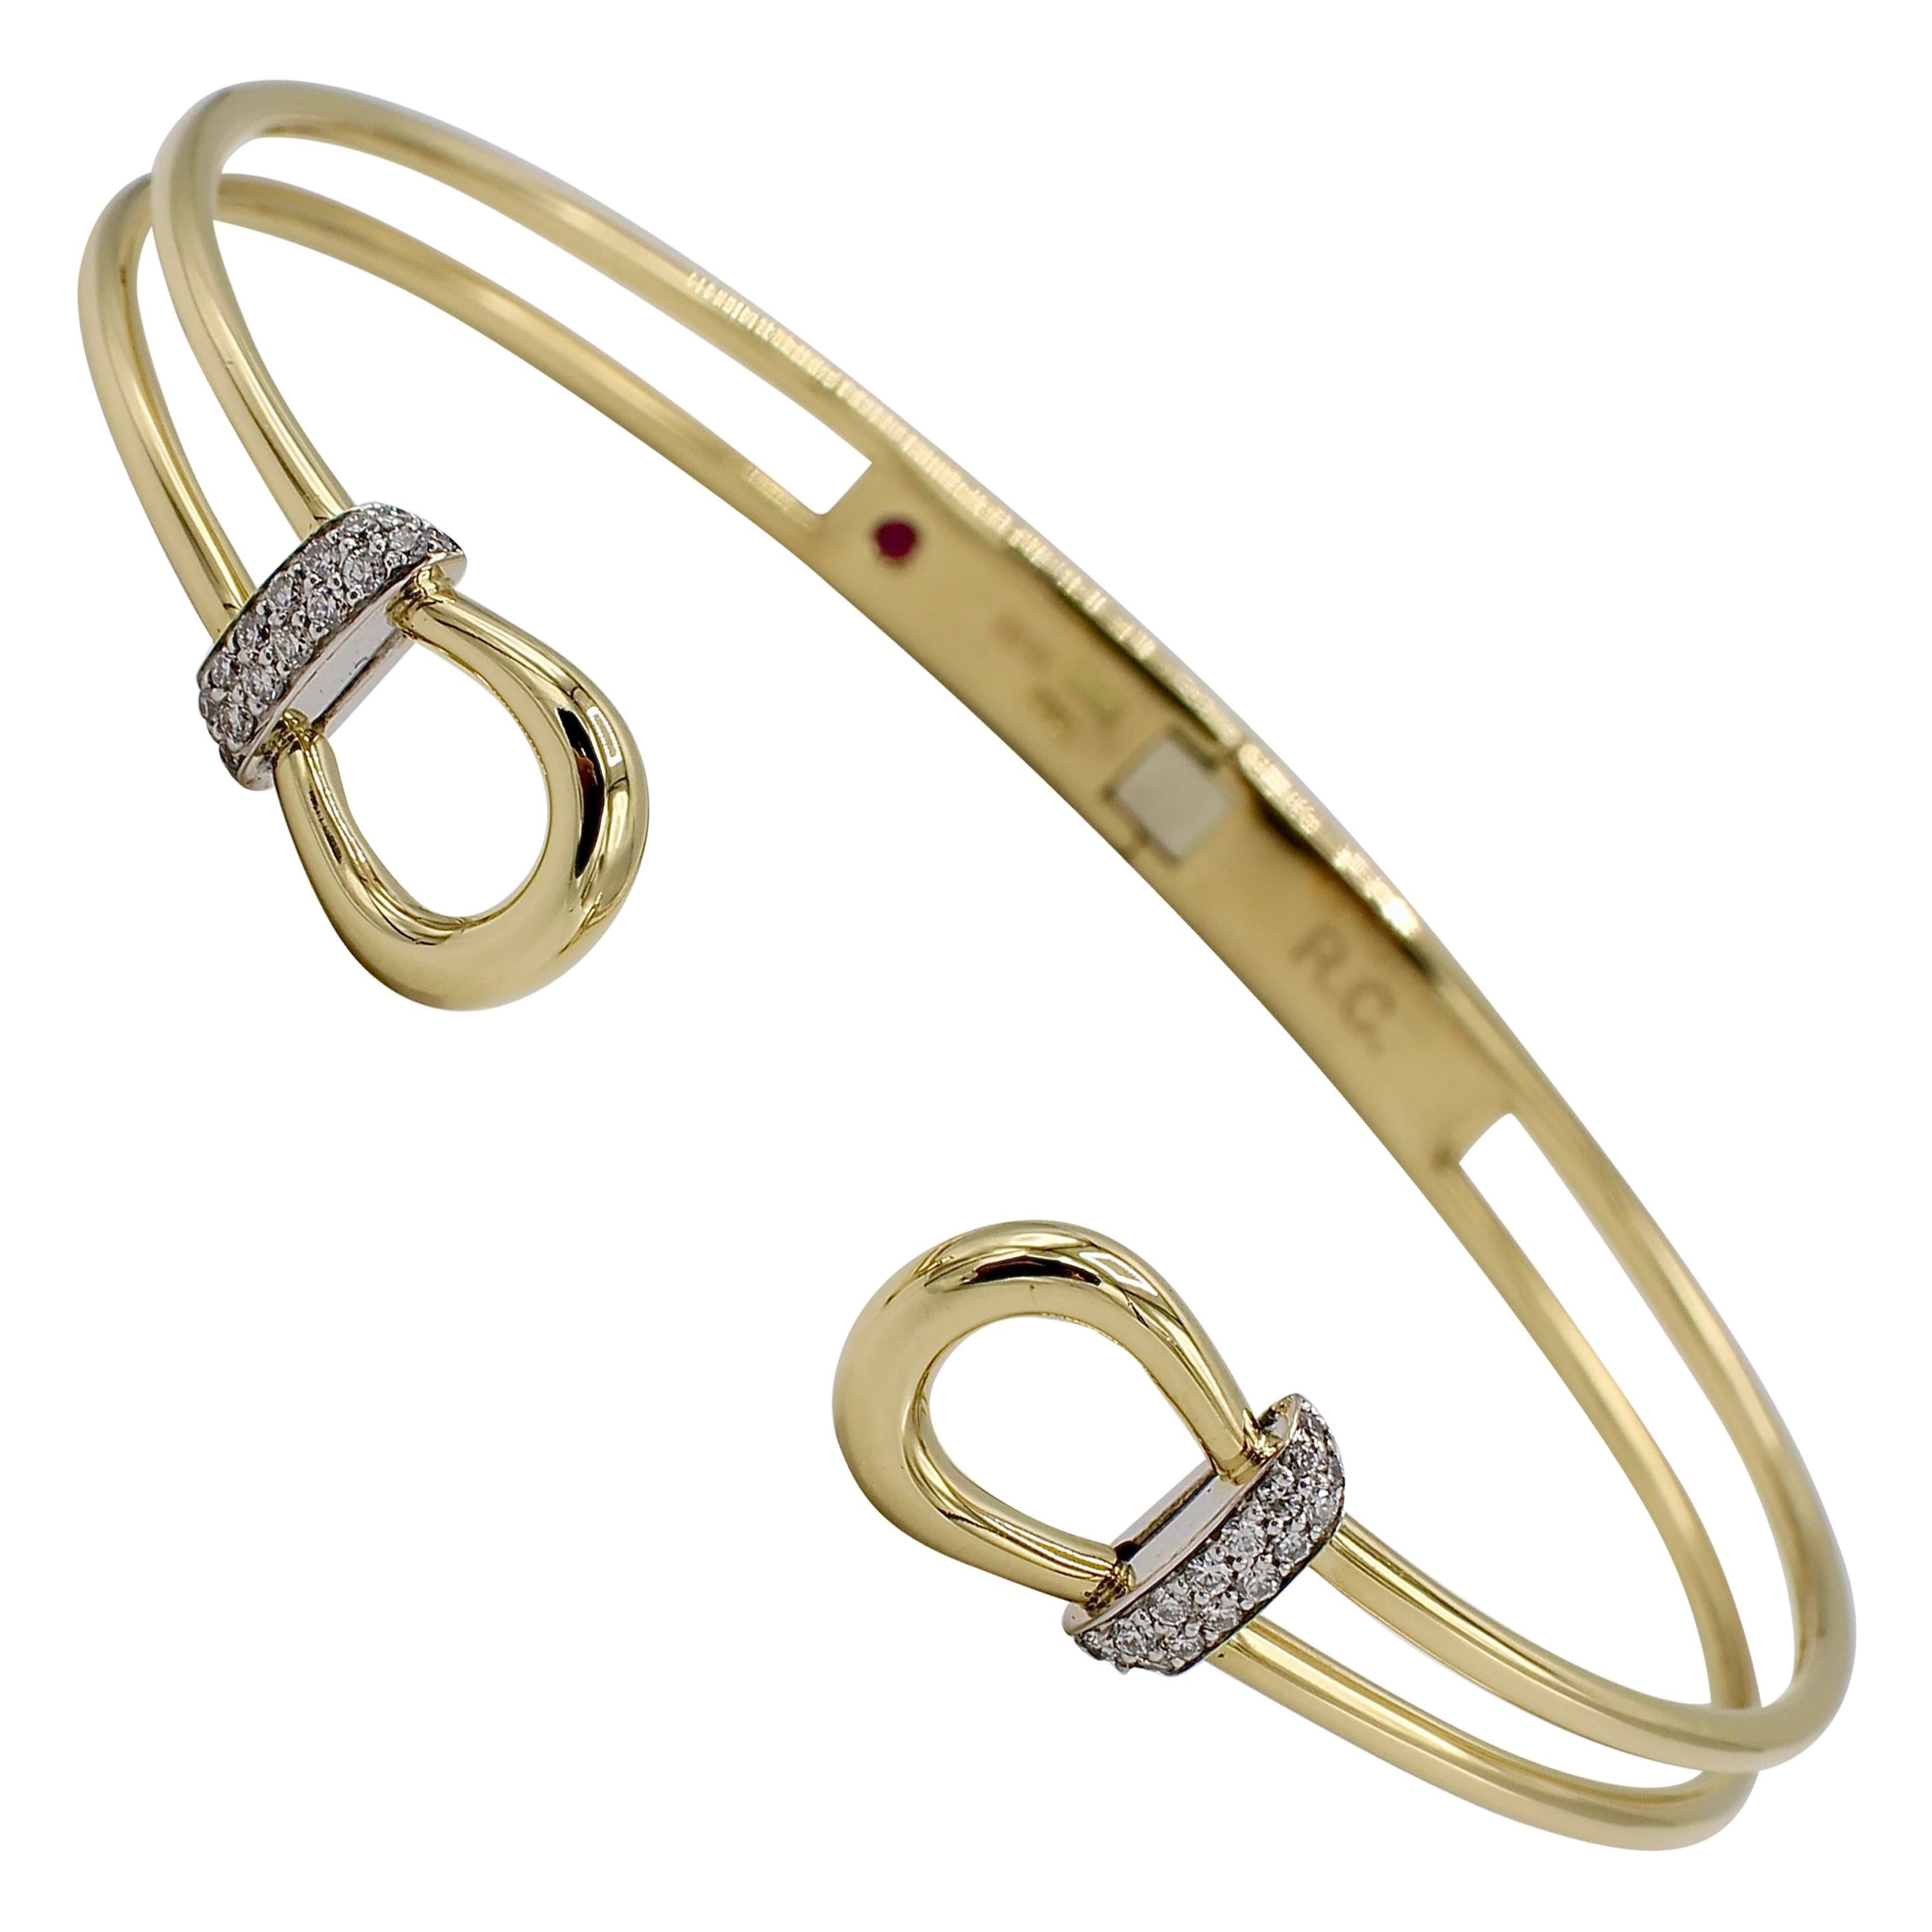 Roberto Coin Classique Parisienne Cheval Diamond Bangle Cuff Bracelet